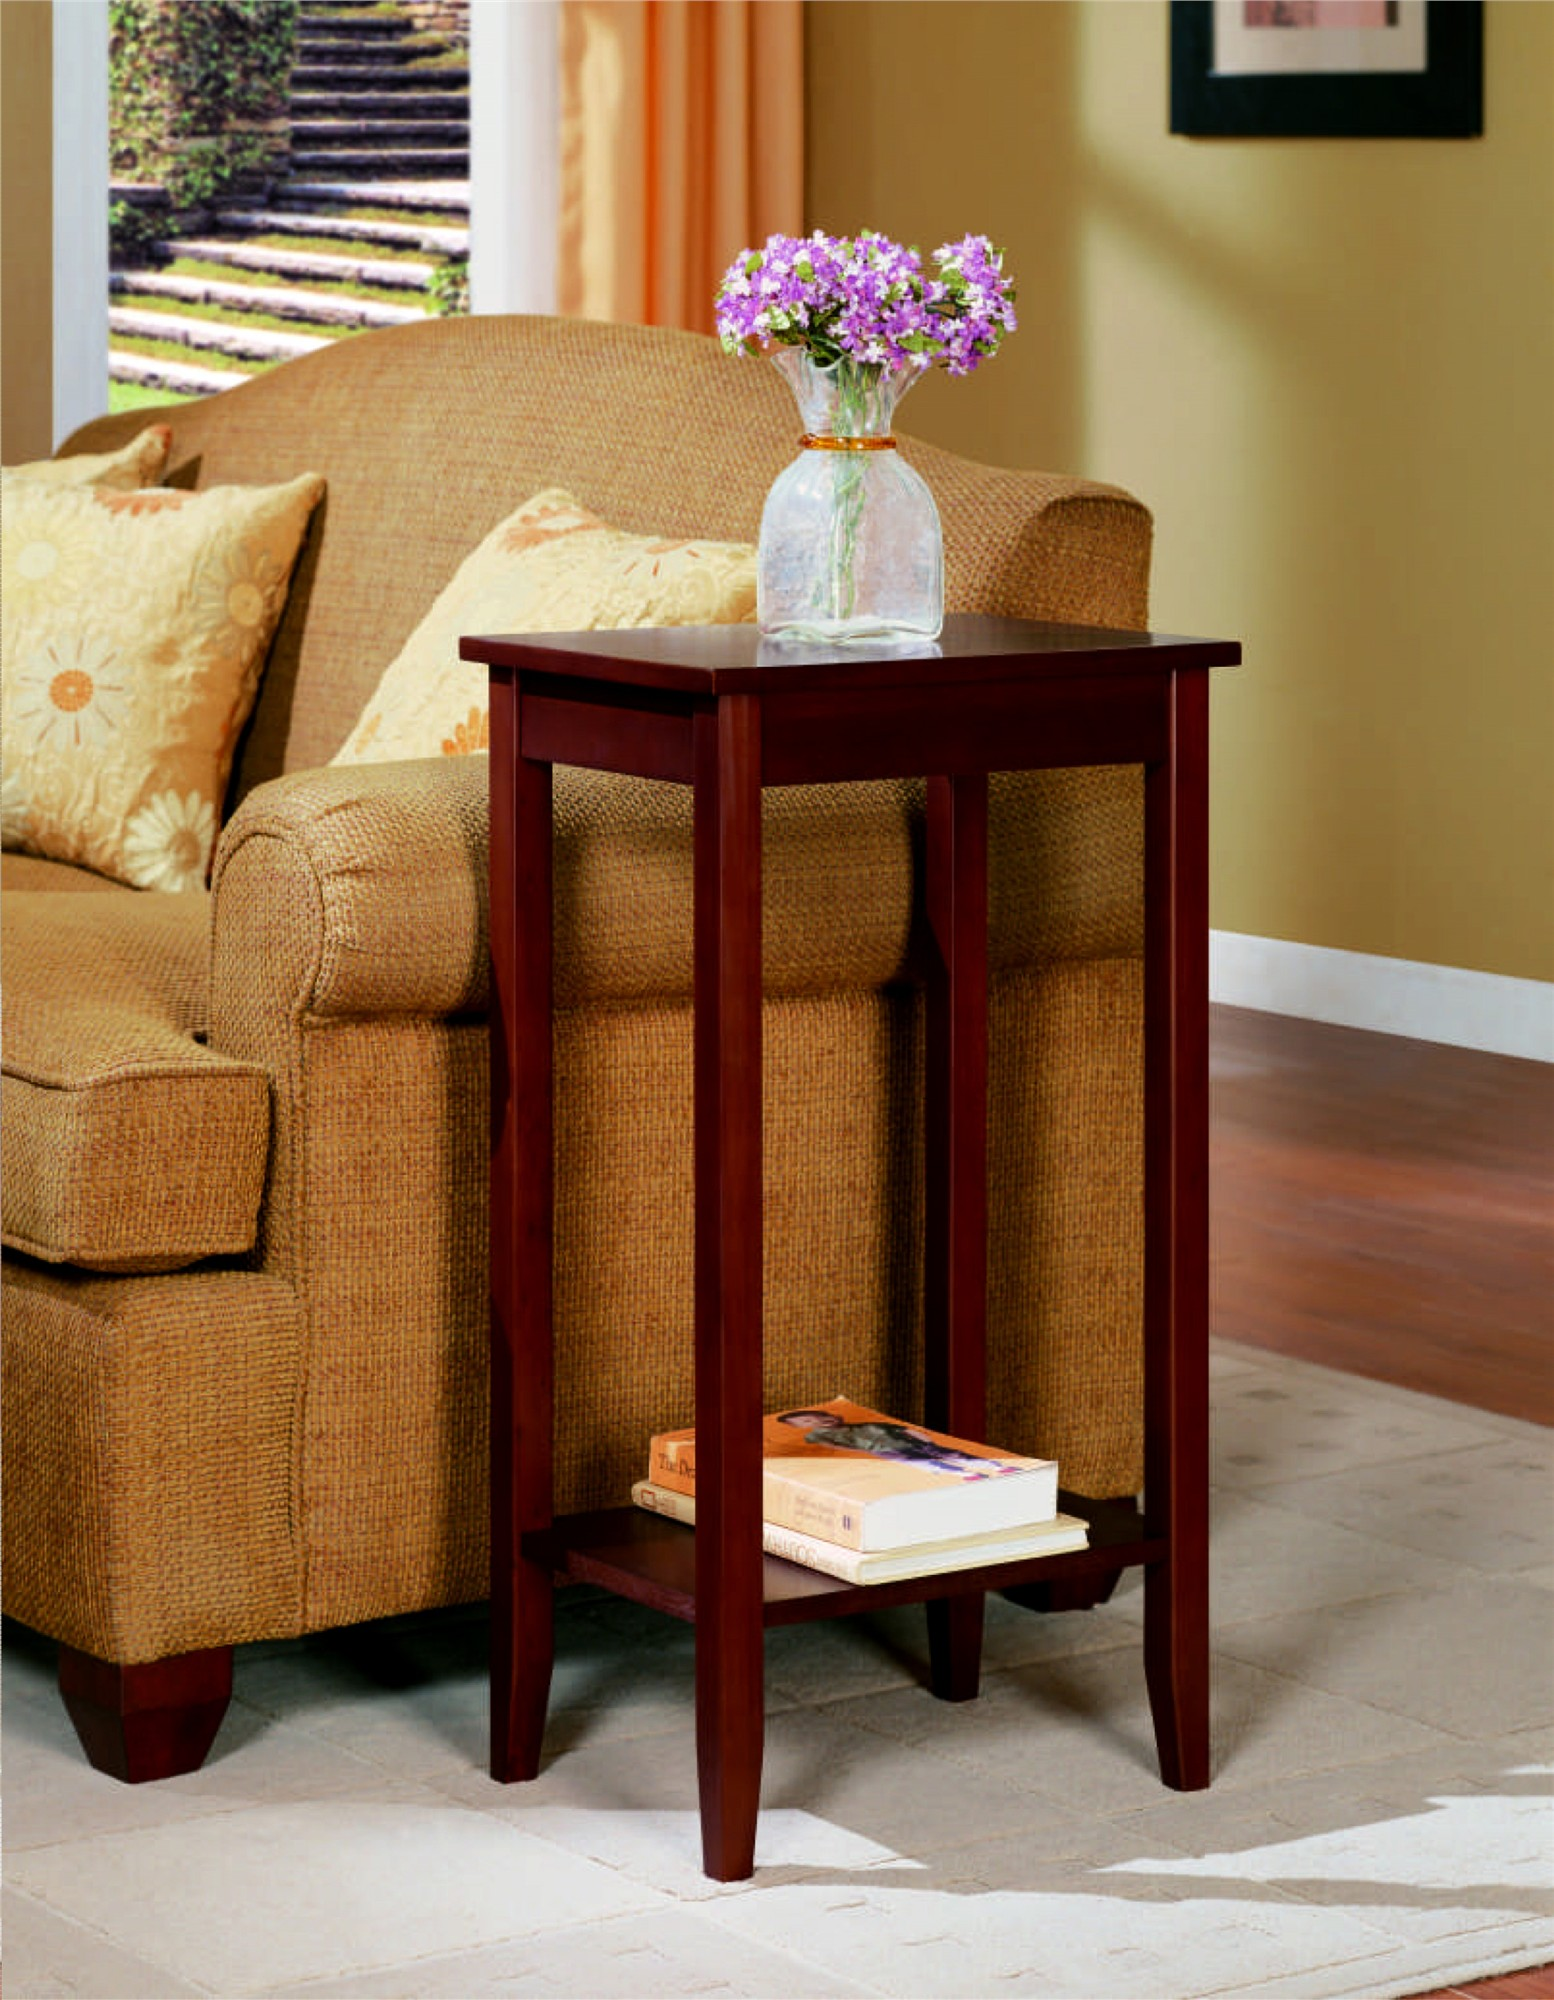 DHP Rosewood Tall End Table, Coffee Brown - Walmart.com - Walmart.com